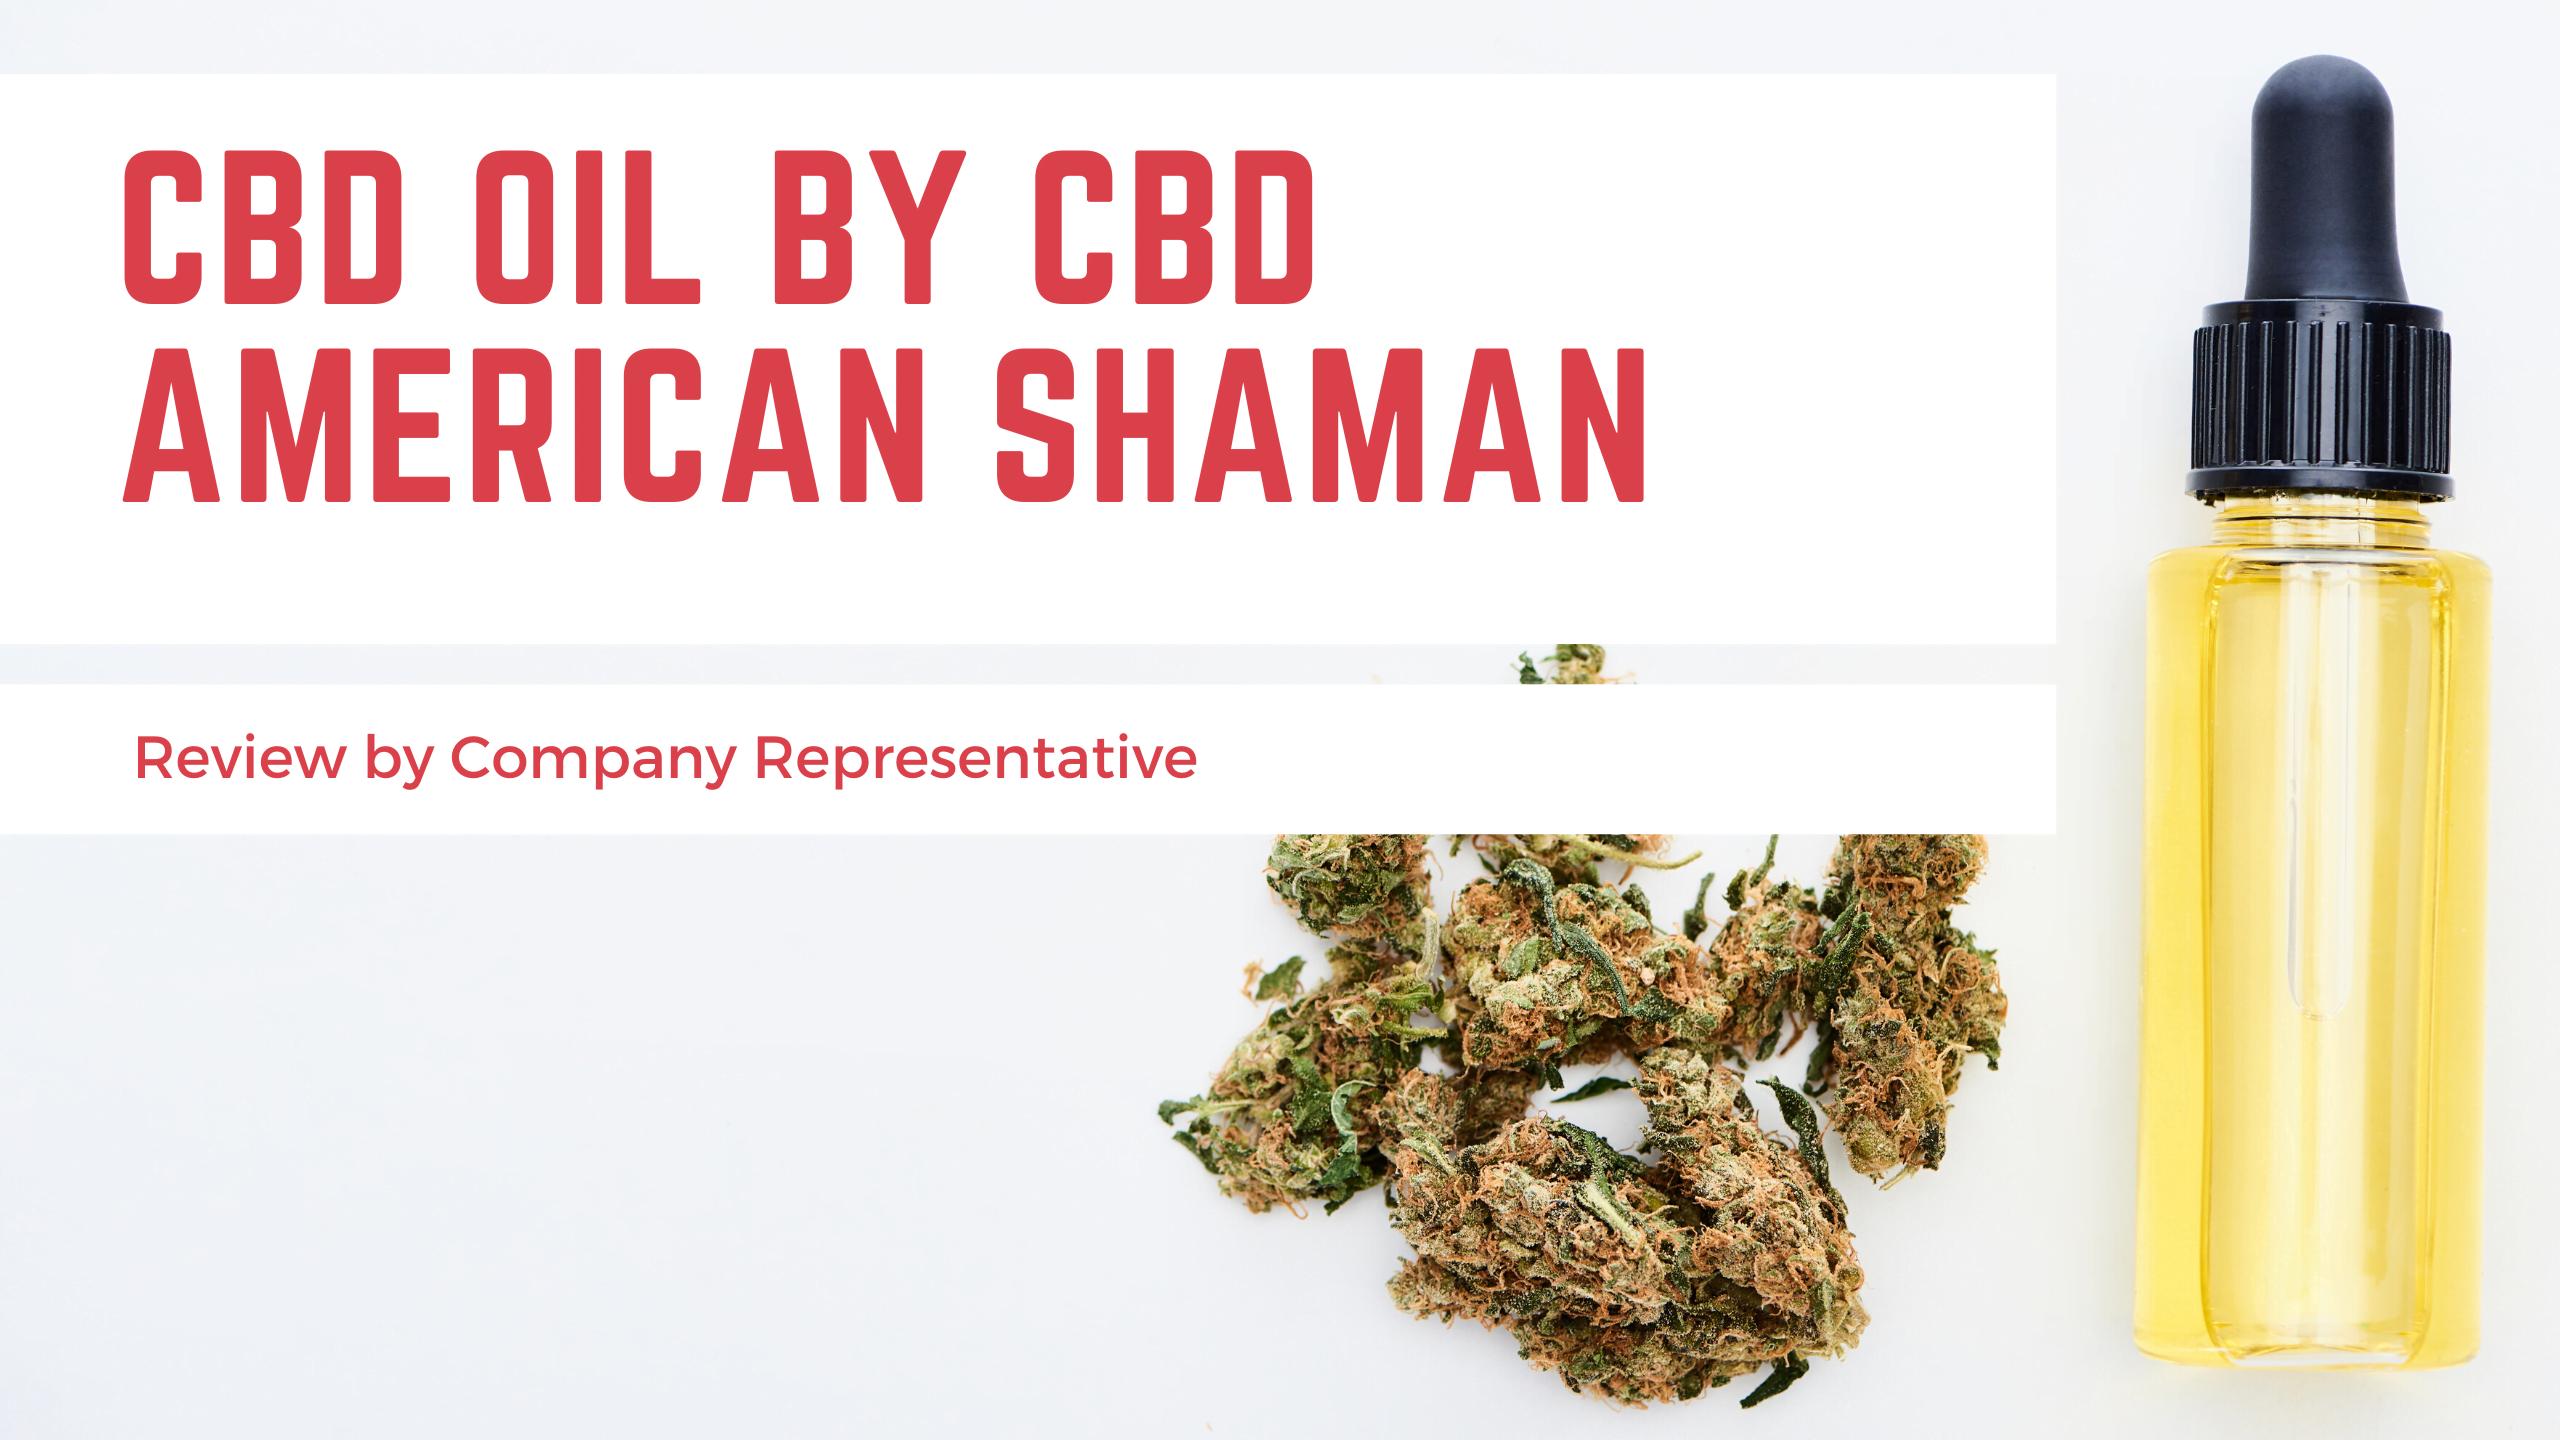 CBD Oil by CBD American Shaman (Review by Company Representative)